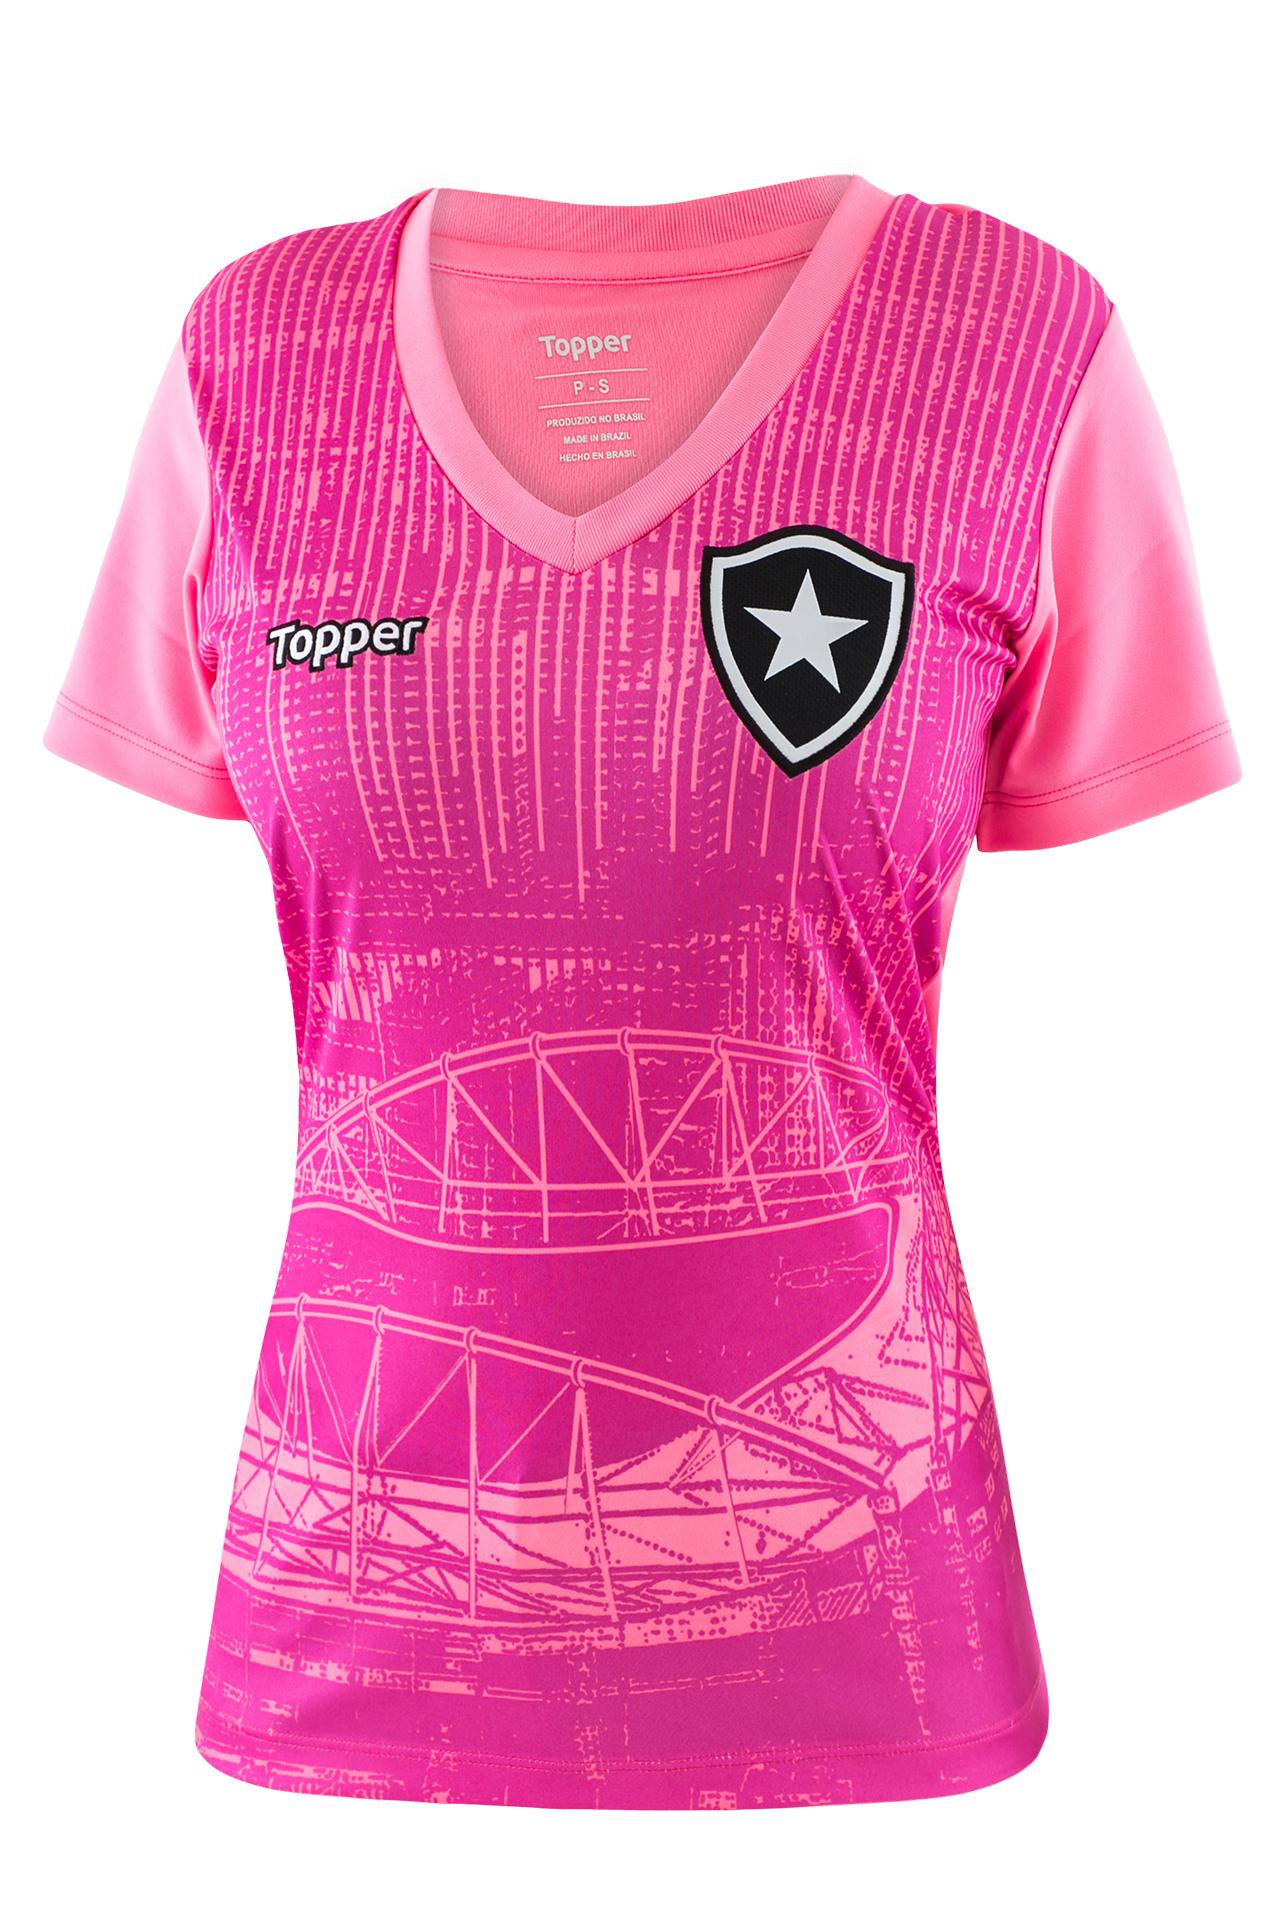 Fornecedora lança camisas alusivas ao Outubro Rosa para 11 clubes ... b0ecc66a24dc4